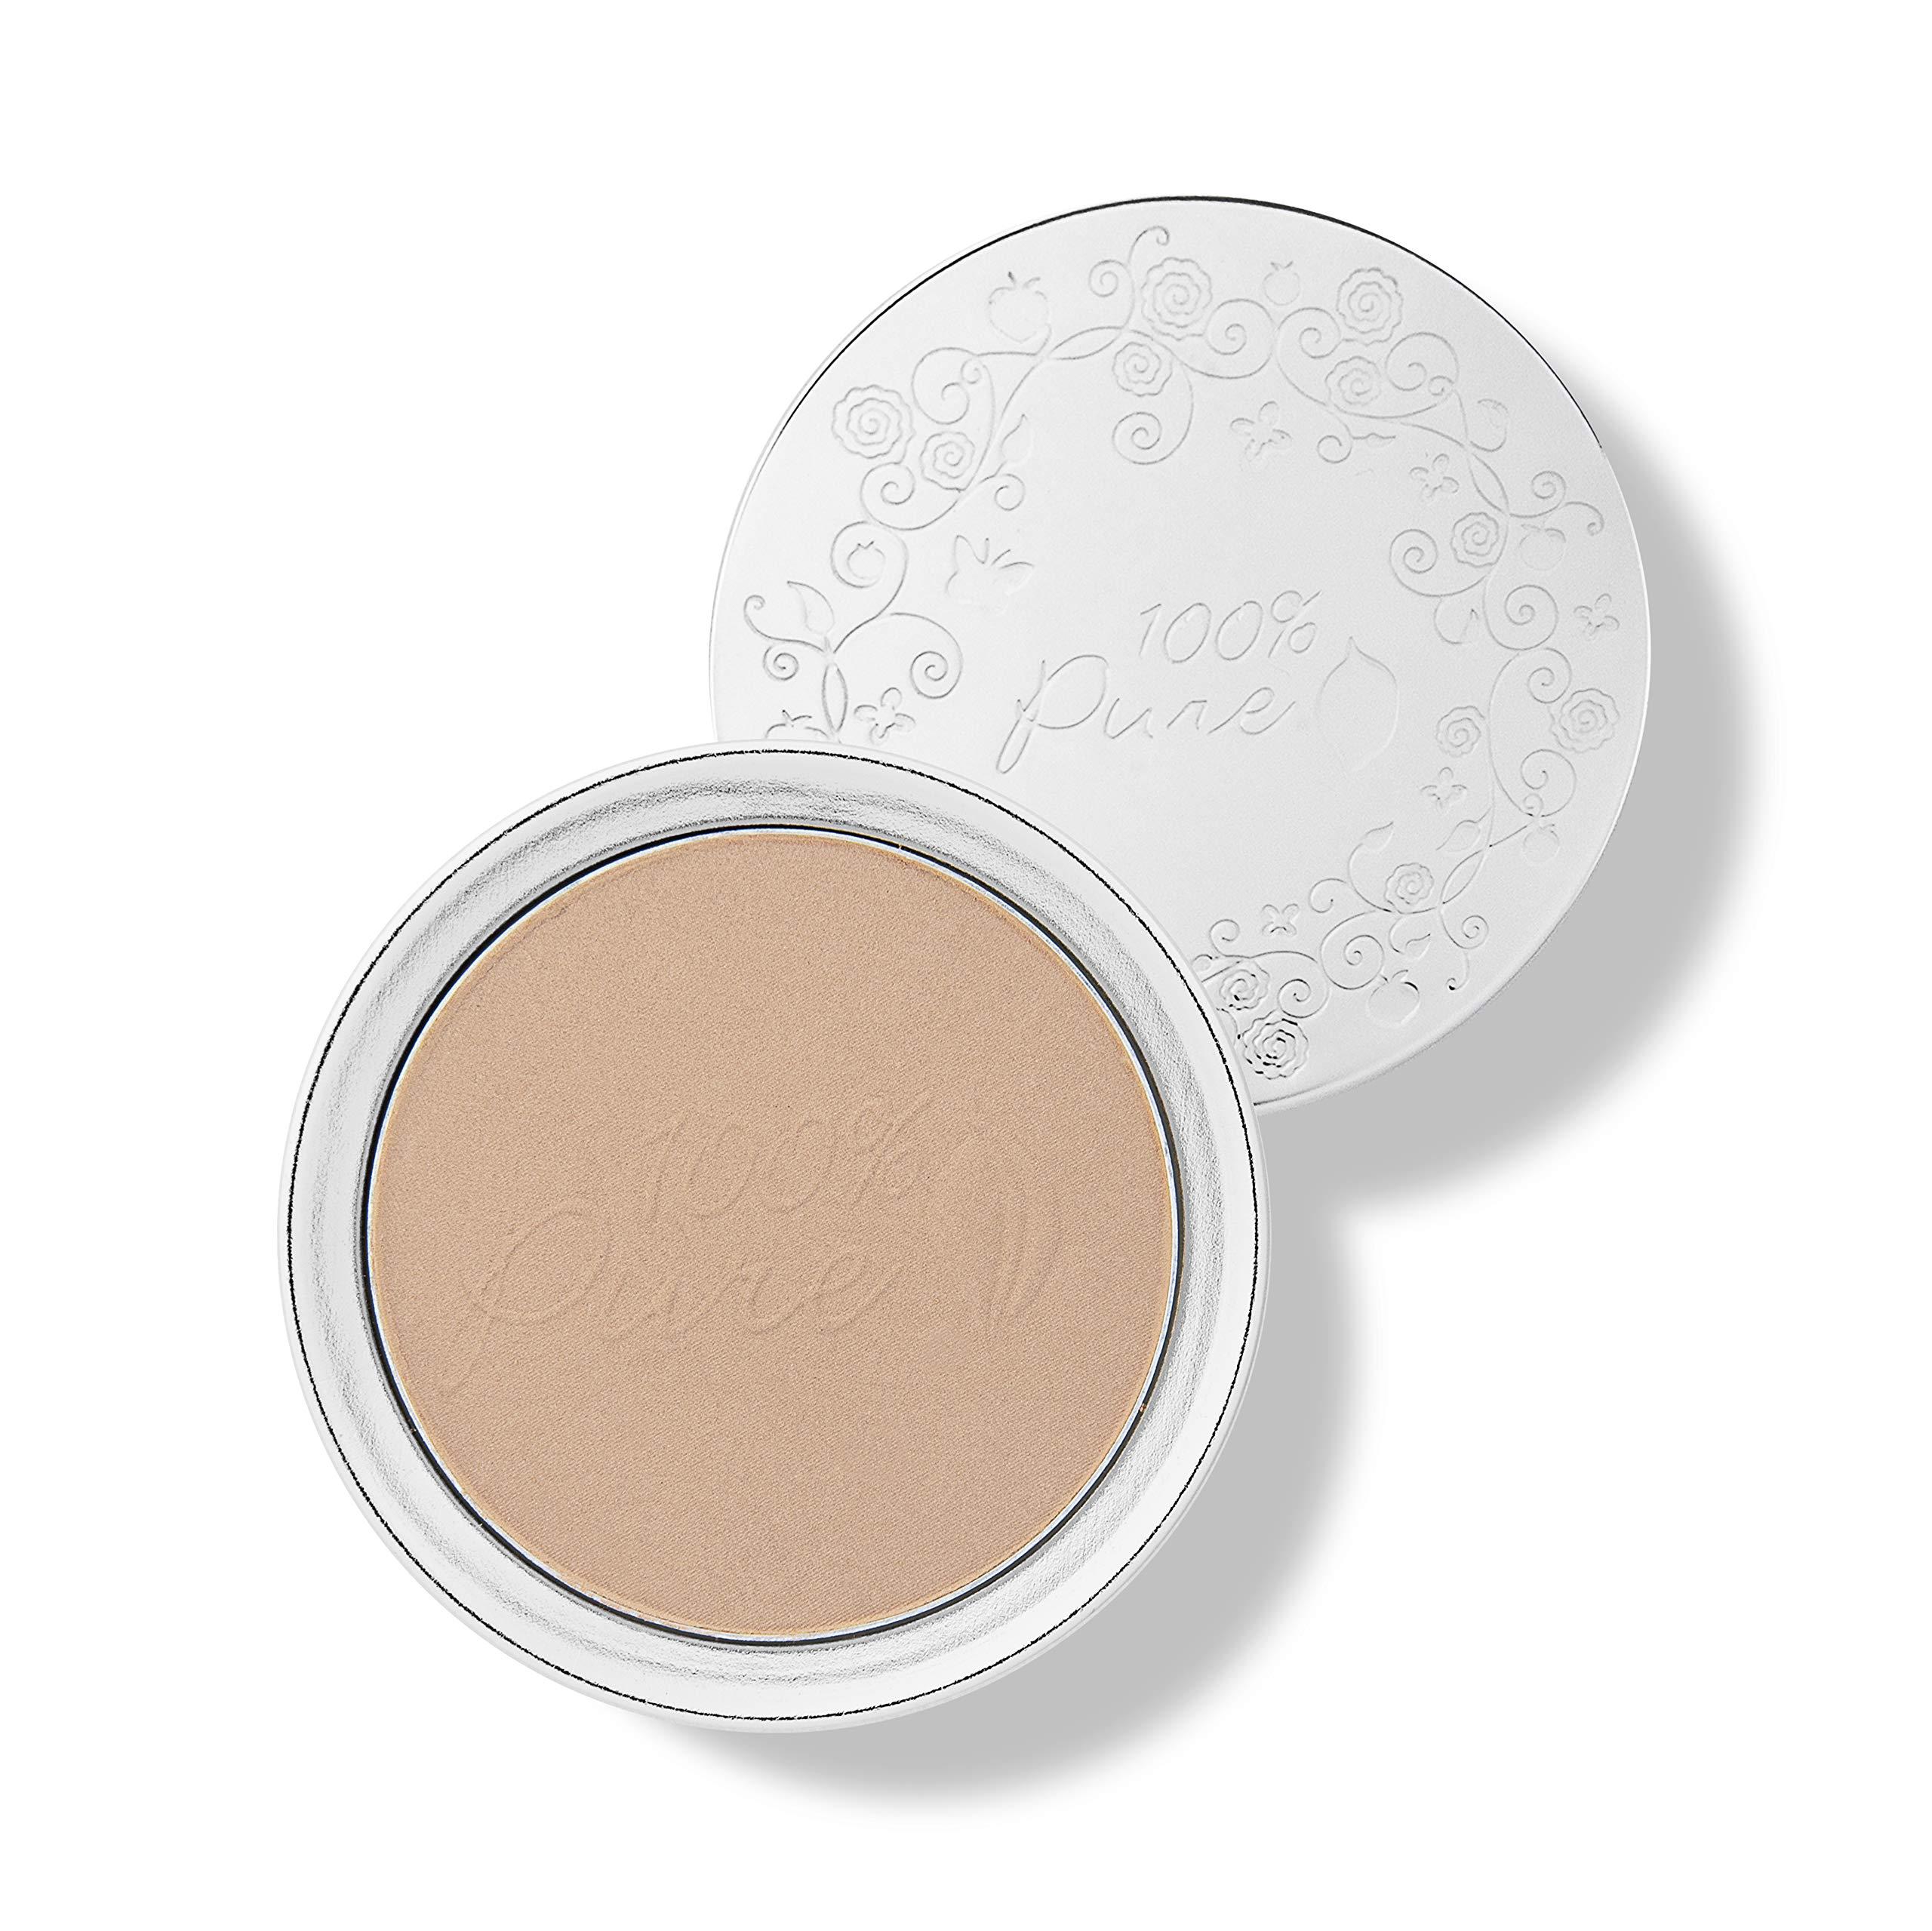 100% PURE Powder Foundation (Fruit Pigmented), Golden Peach, Matte Finish, Absorbs Oil, Anti-Aging, Helps Fight Acne, Natural, Vegan Makeup (Medium-Tan Shade w/Neutral Undertones) - 0.32 Oz